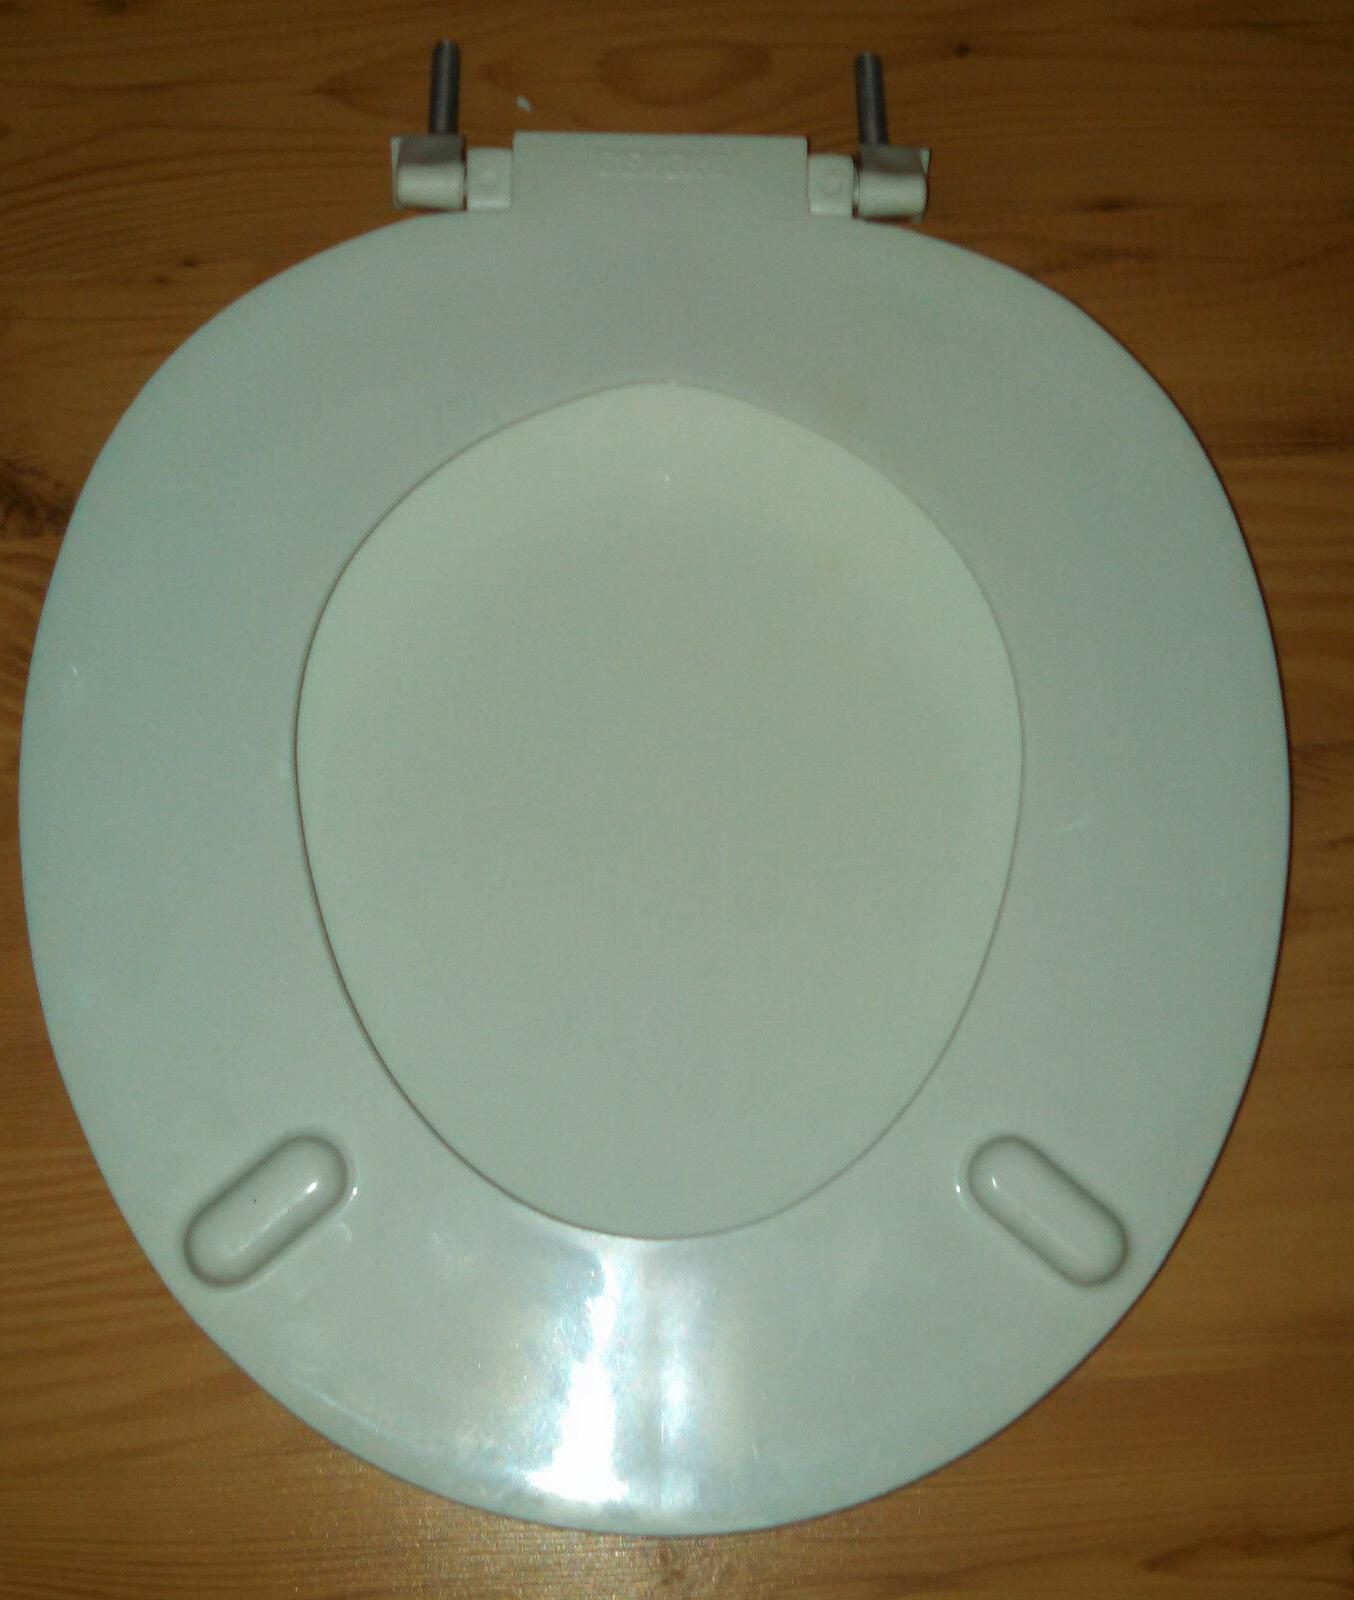 Beneke Plastic Round Front Toilet Seat - H -